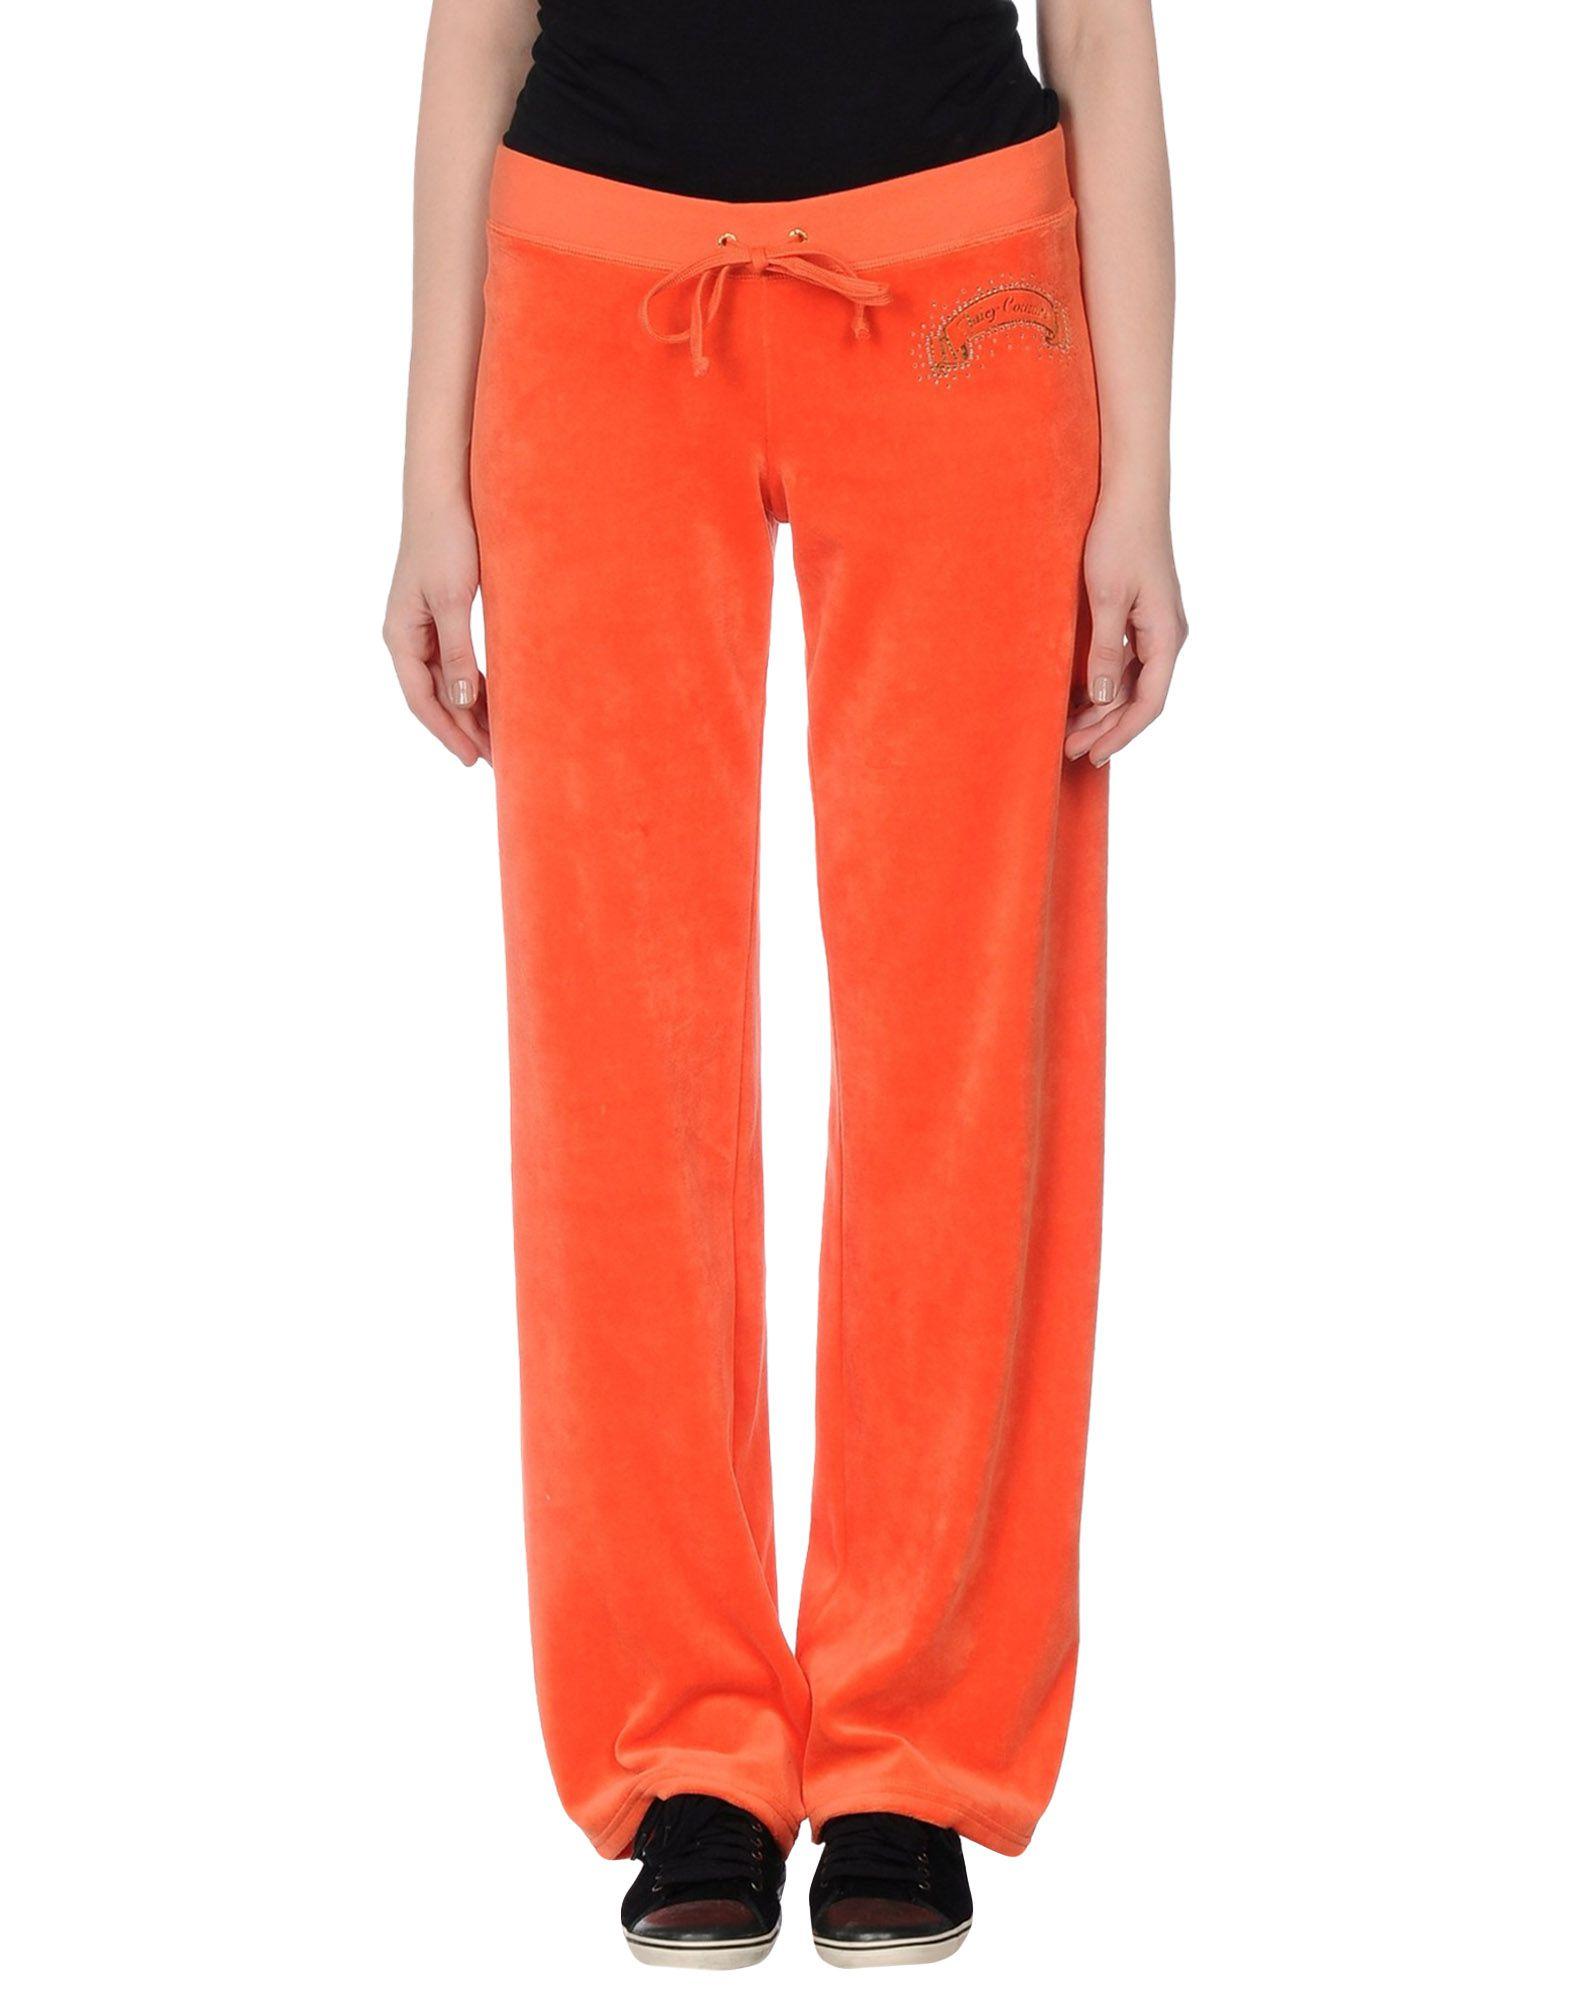 Model Balmain High Waist Warp Effect Knit Pants Orange Women Clothing WOMEN